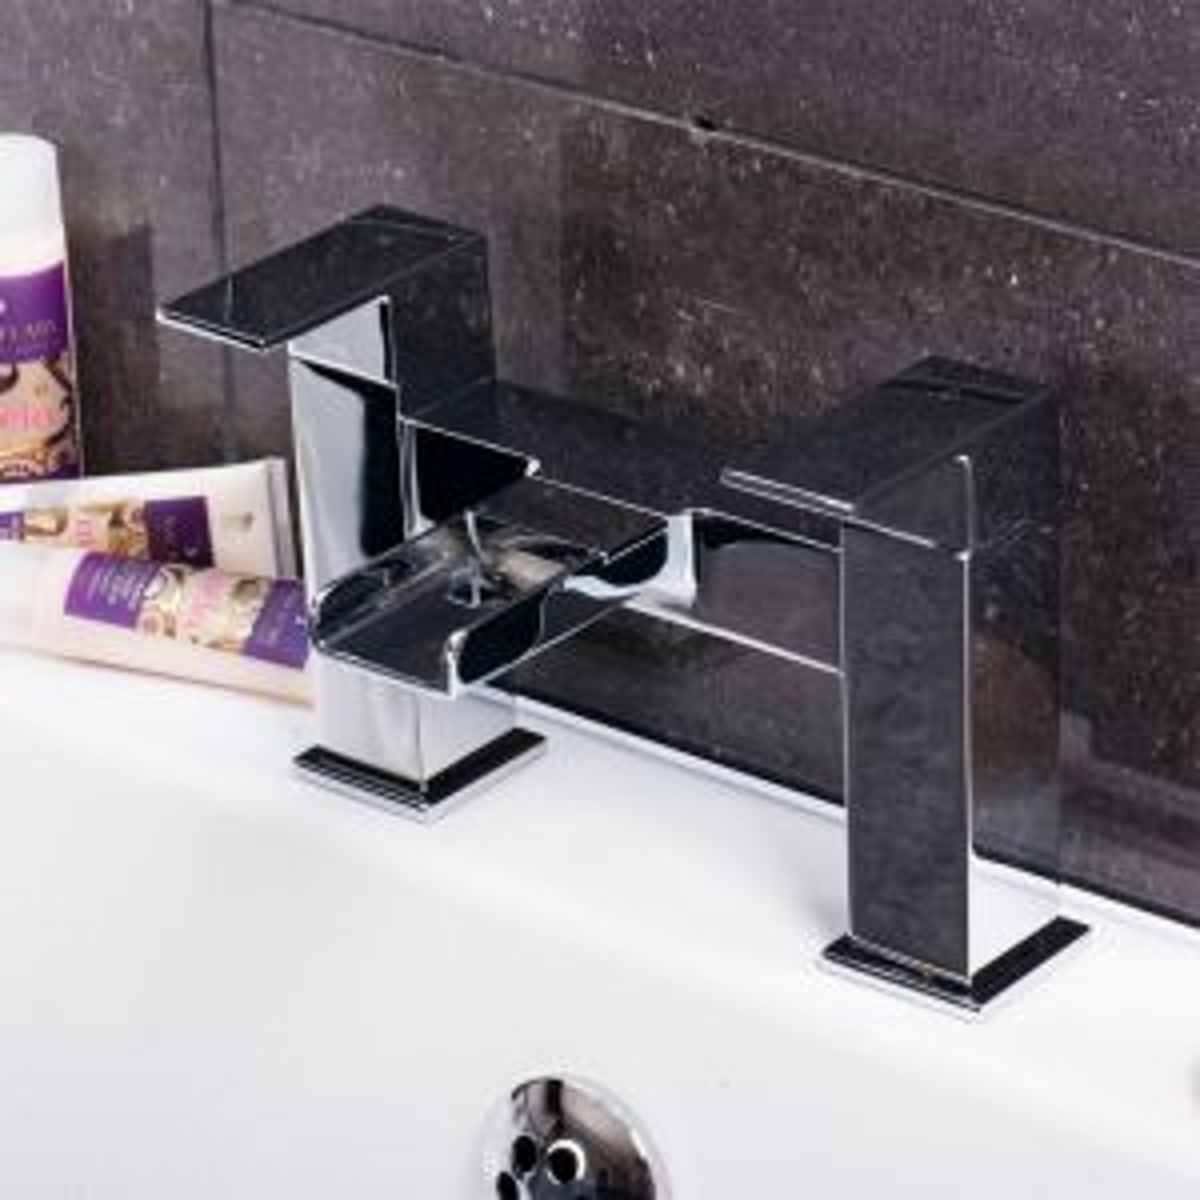 Zenith Dunk Bath Filler Tap Lifestyle